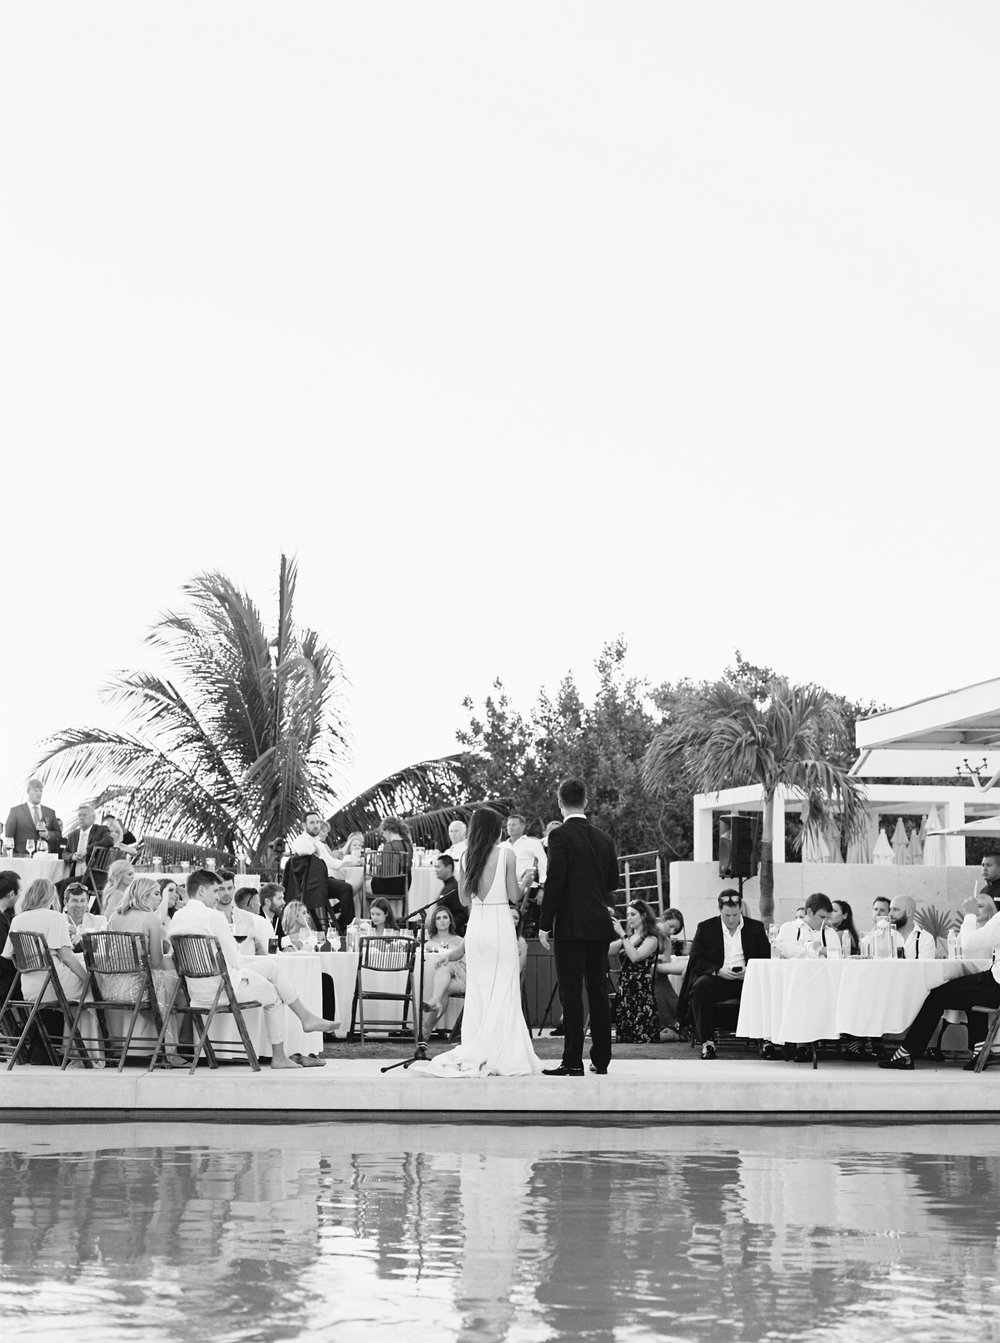 Kyle John l Fine Art Wedding Photography l Chicago, Copenhagen, California, New York, Destination l Blog l Brooke Boyd_The Film Poets_Tulum Wedding_39